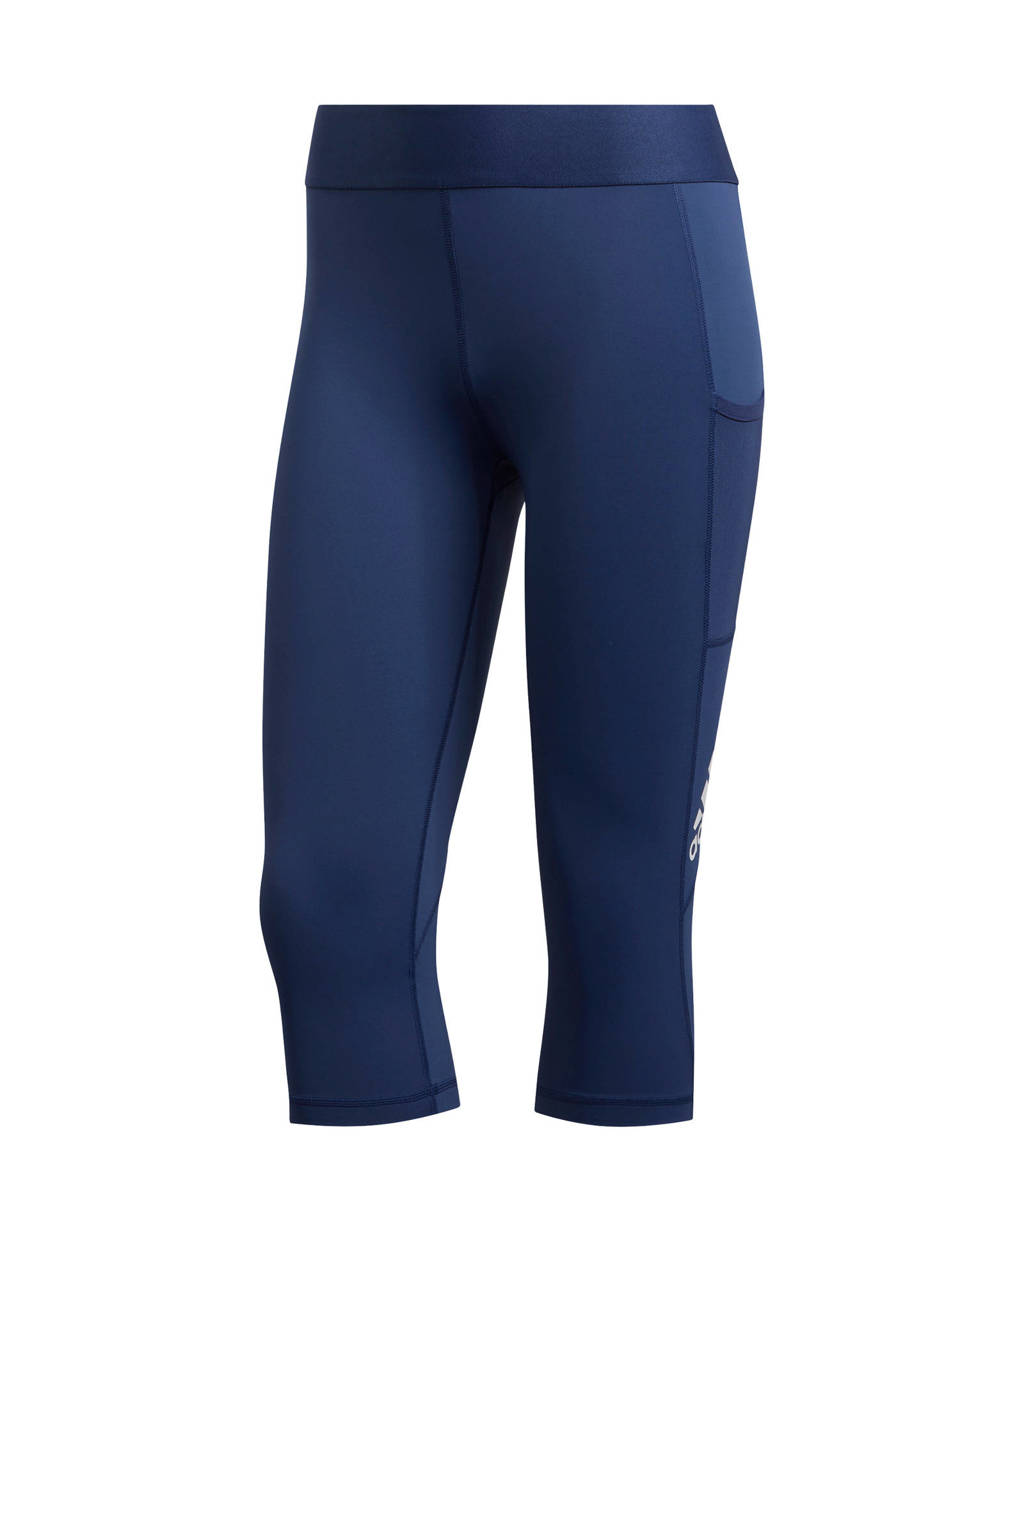 adidas Performance sportbroek blauw, Blauw